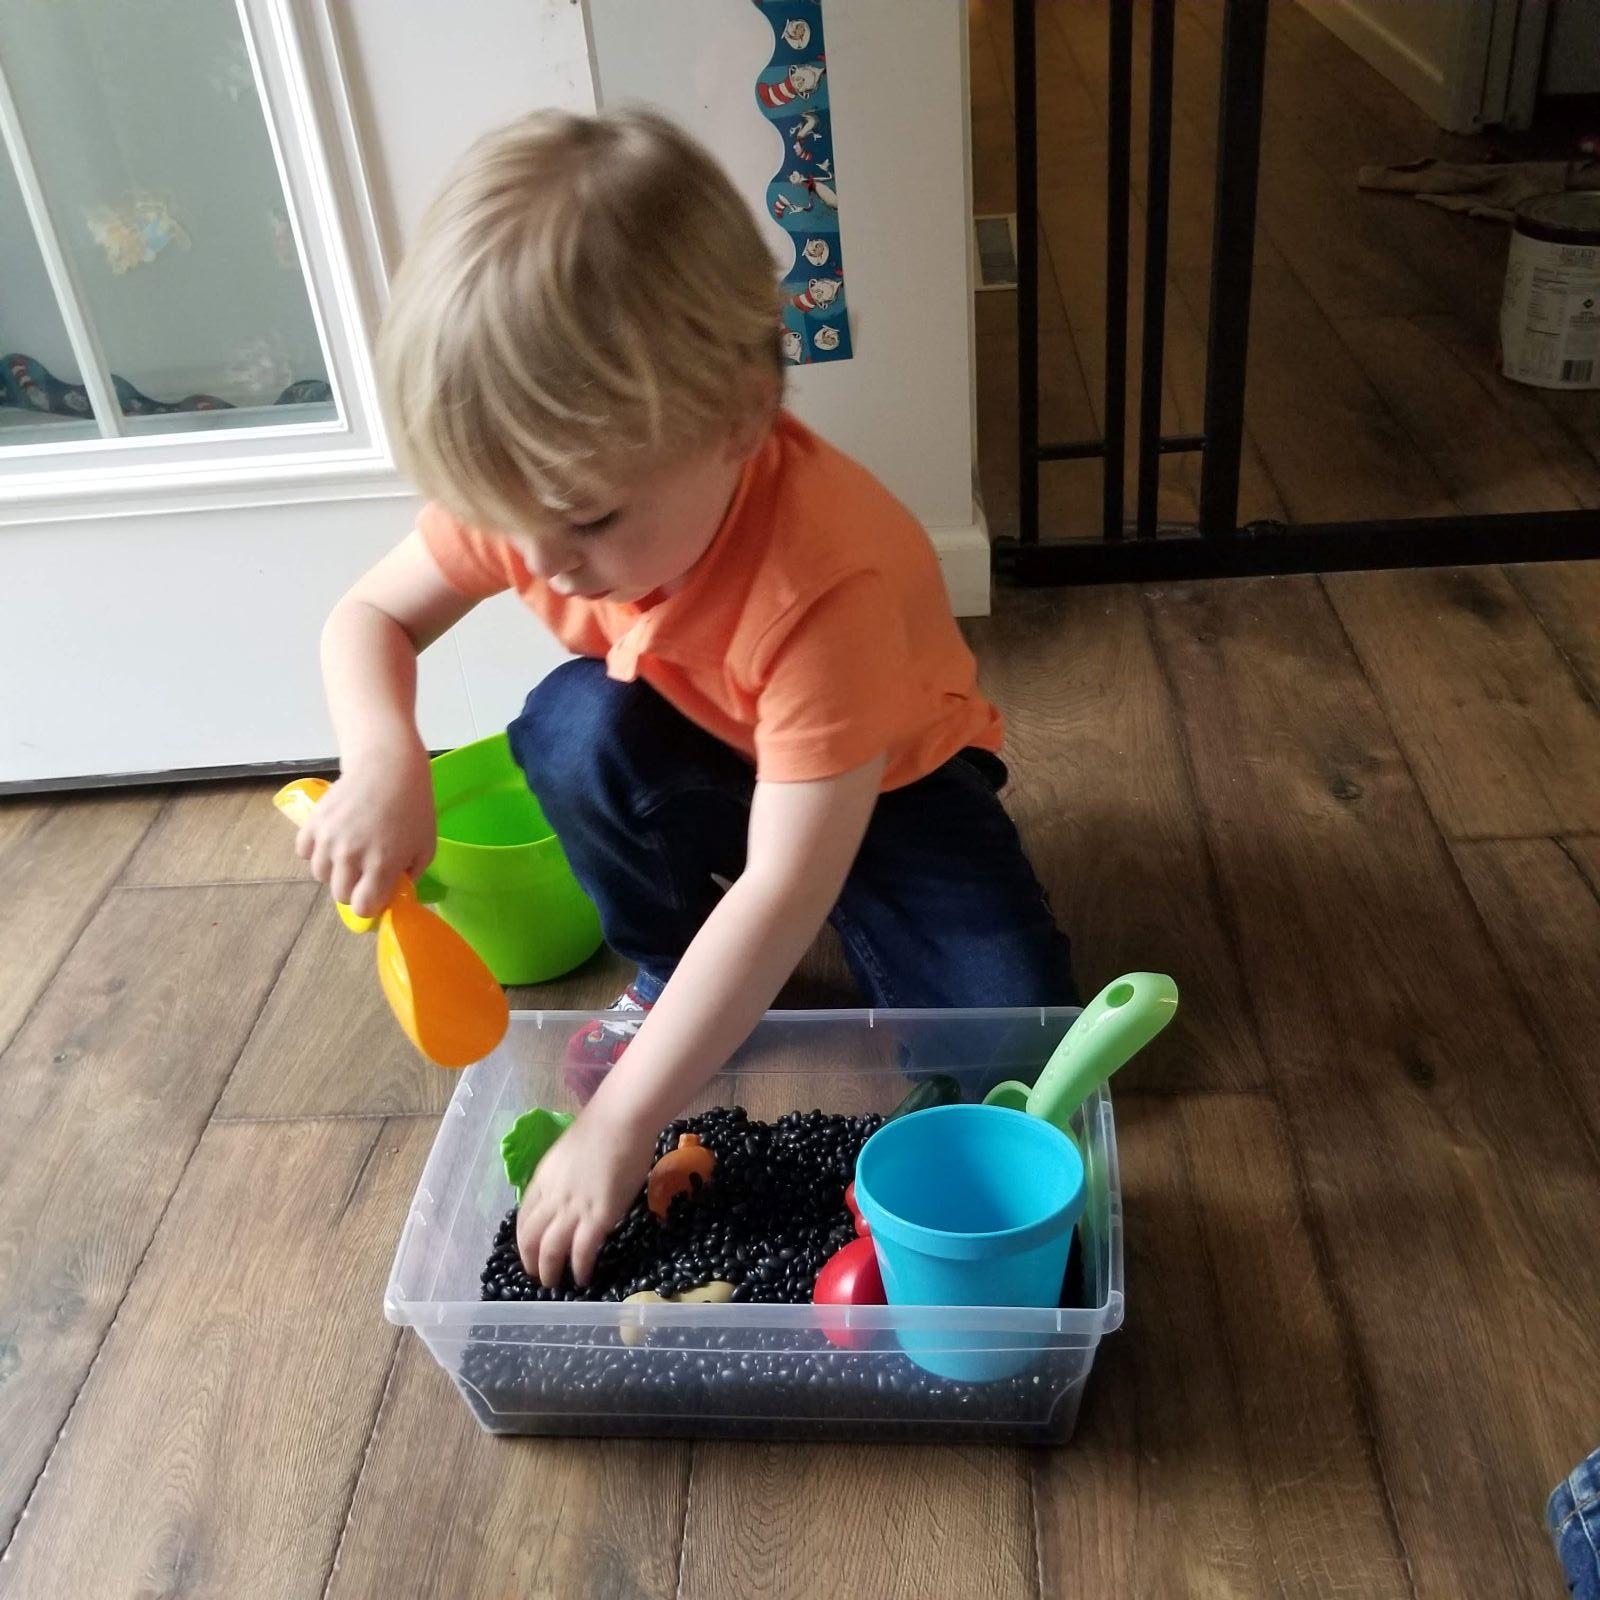 toddler digging in gendering bin